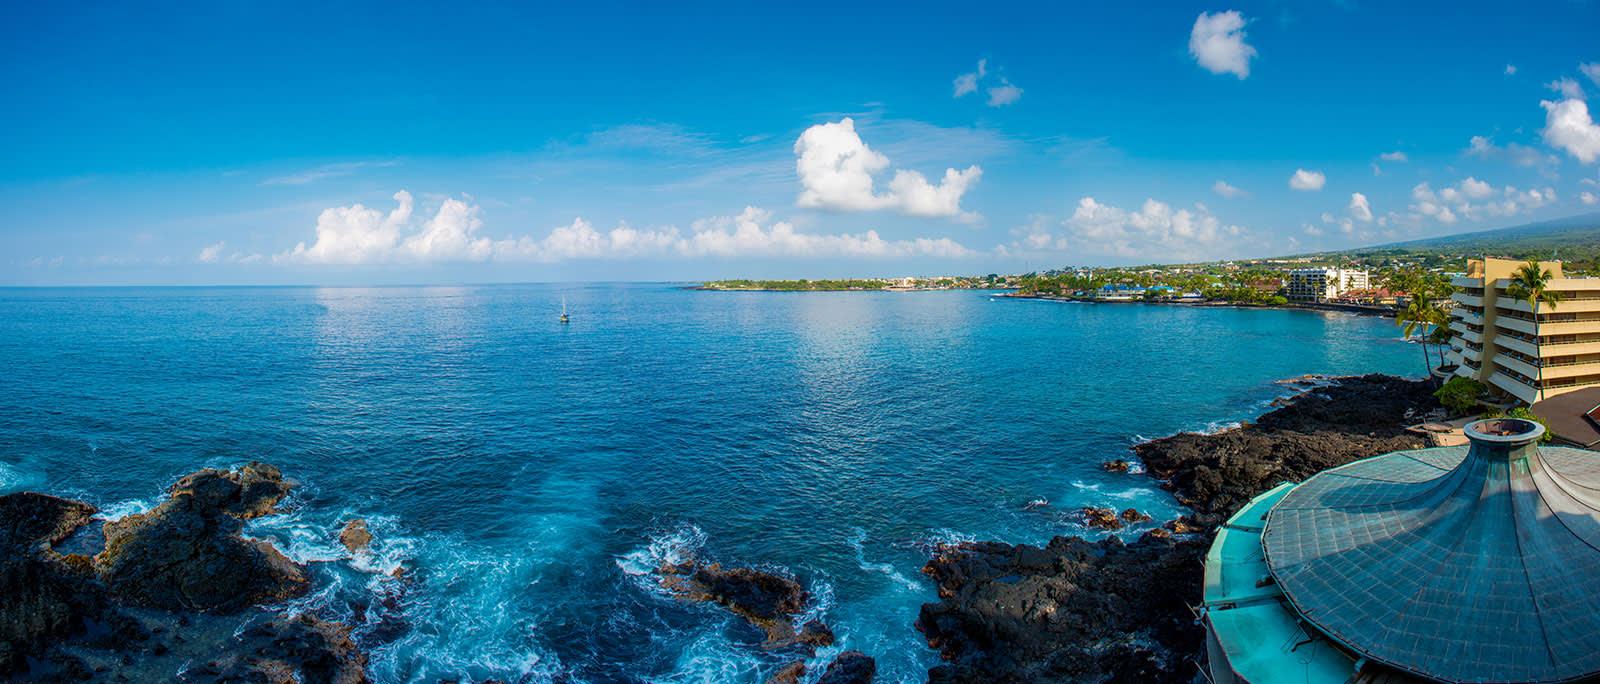 Our Resort of Royal Kona Resort, Hawaii